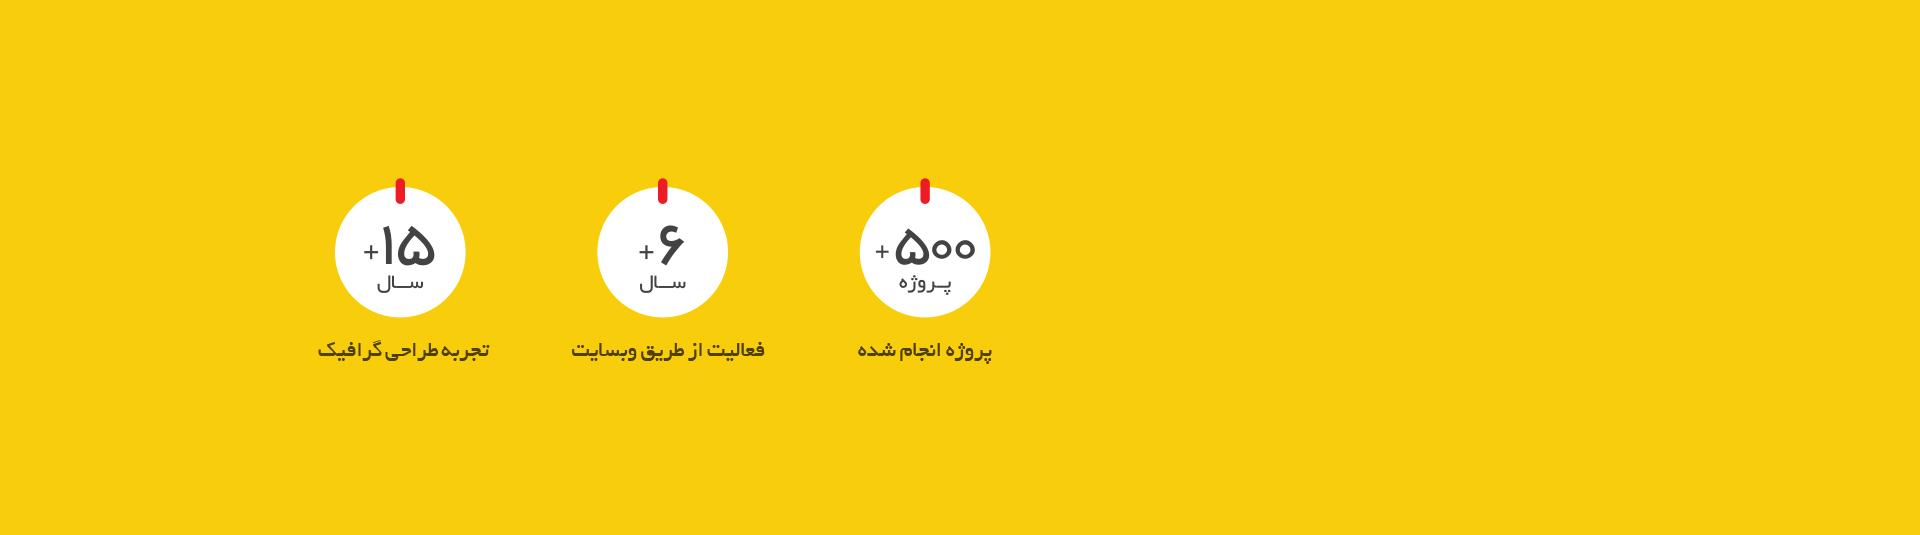 طراحی لوگو ی خوب ، تخصص ماست ›› طراحی لوگو | طراحی نشان | طراحی ...طراحی لوگوی خوب ، تخصص ماست. یک لوگو یا آرم ...